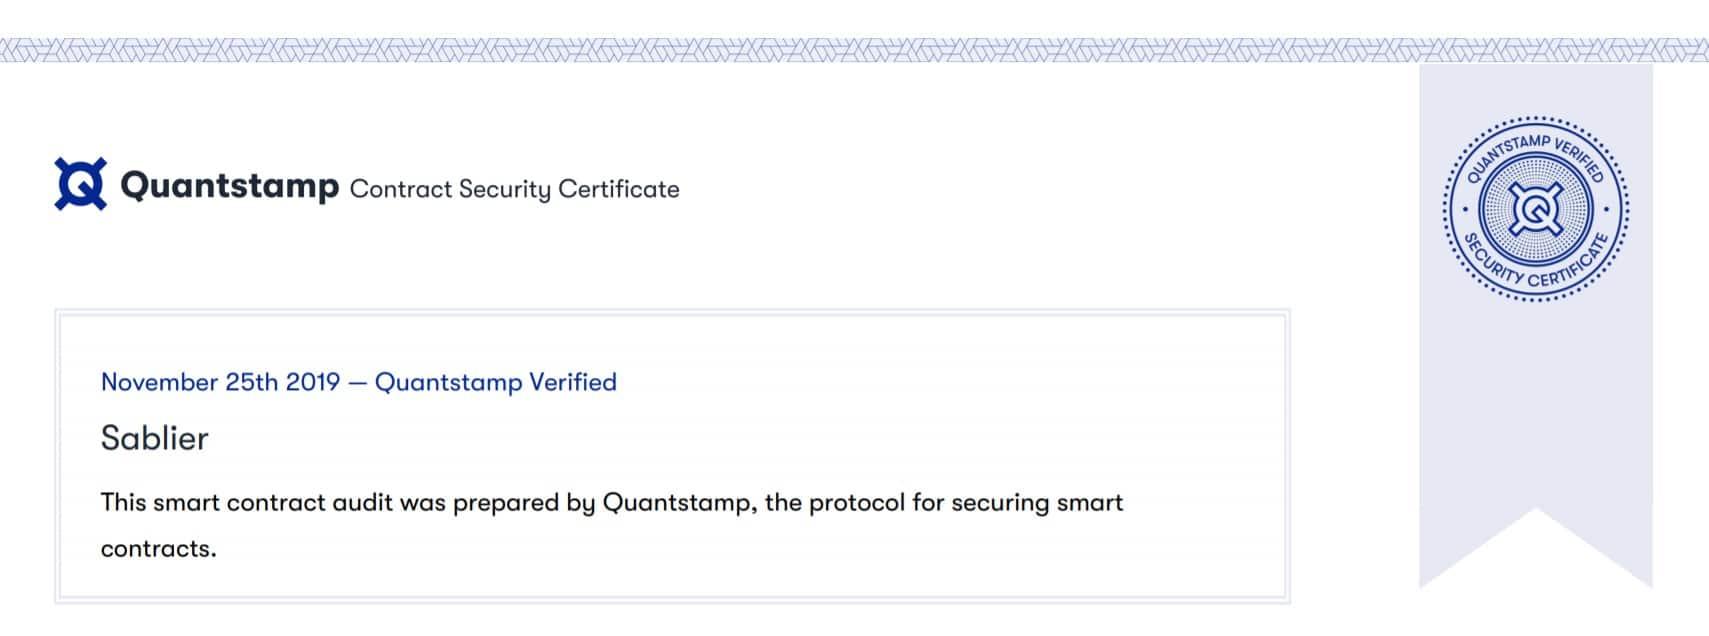 quantstamp certificate